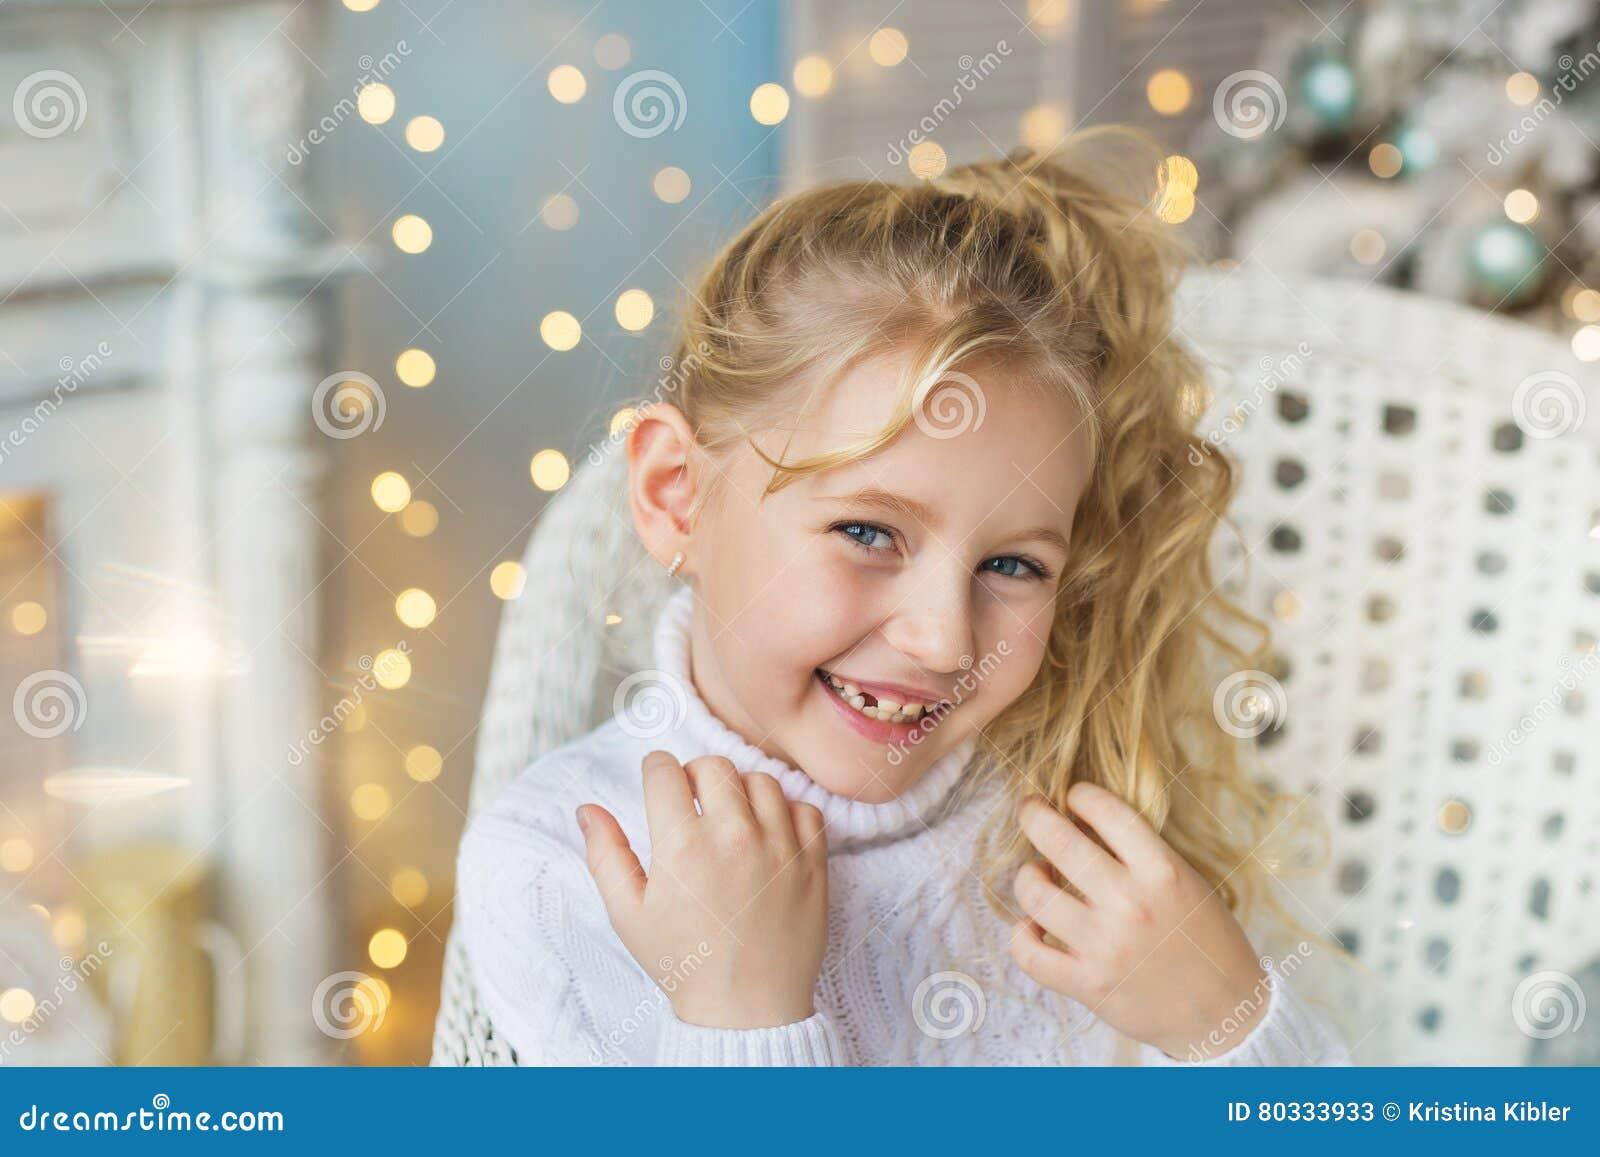 portrait of blonde pretty little girl very smiles in. Black Bedroom Furniture Sets. Home Design Ideas